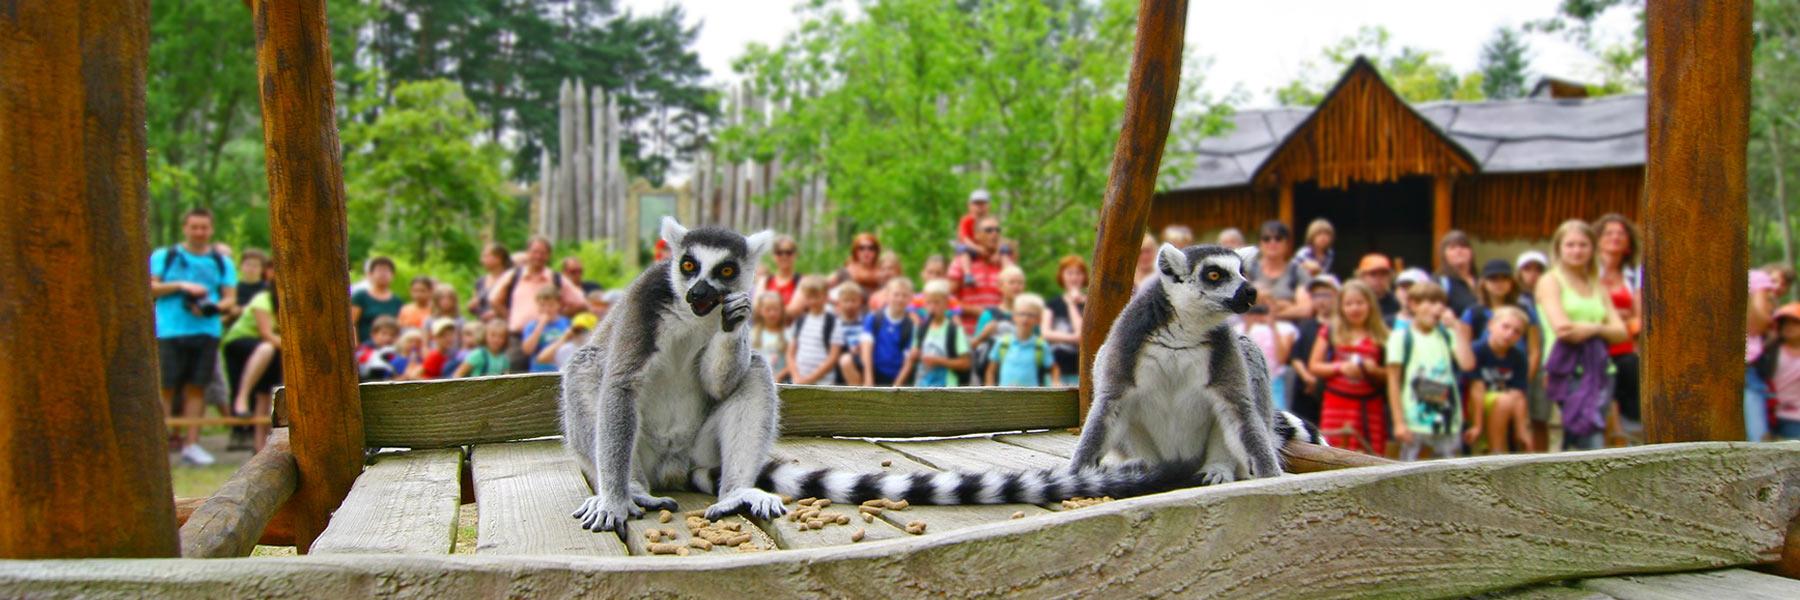 Lemuren - Vogelpark Marlow gGmbH